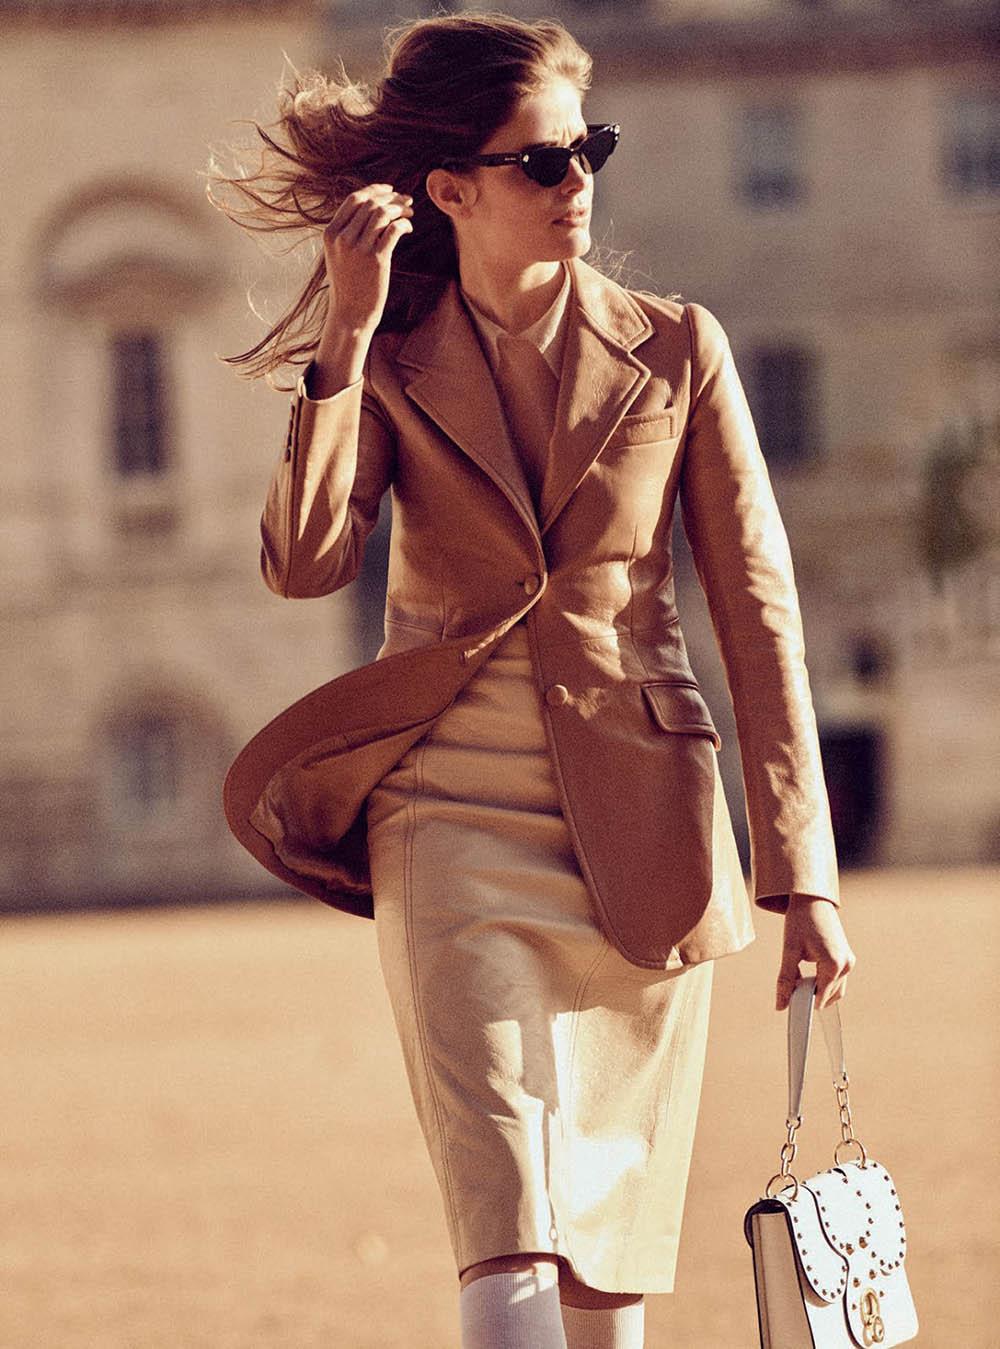 Alisa-Ahmann-by-Regan-Cameron-for-Harper's-Bazaar-UK-March-2019-1.jpg